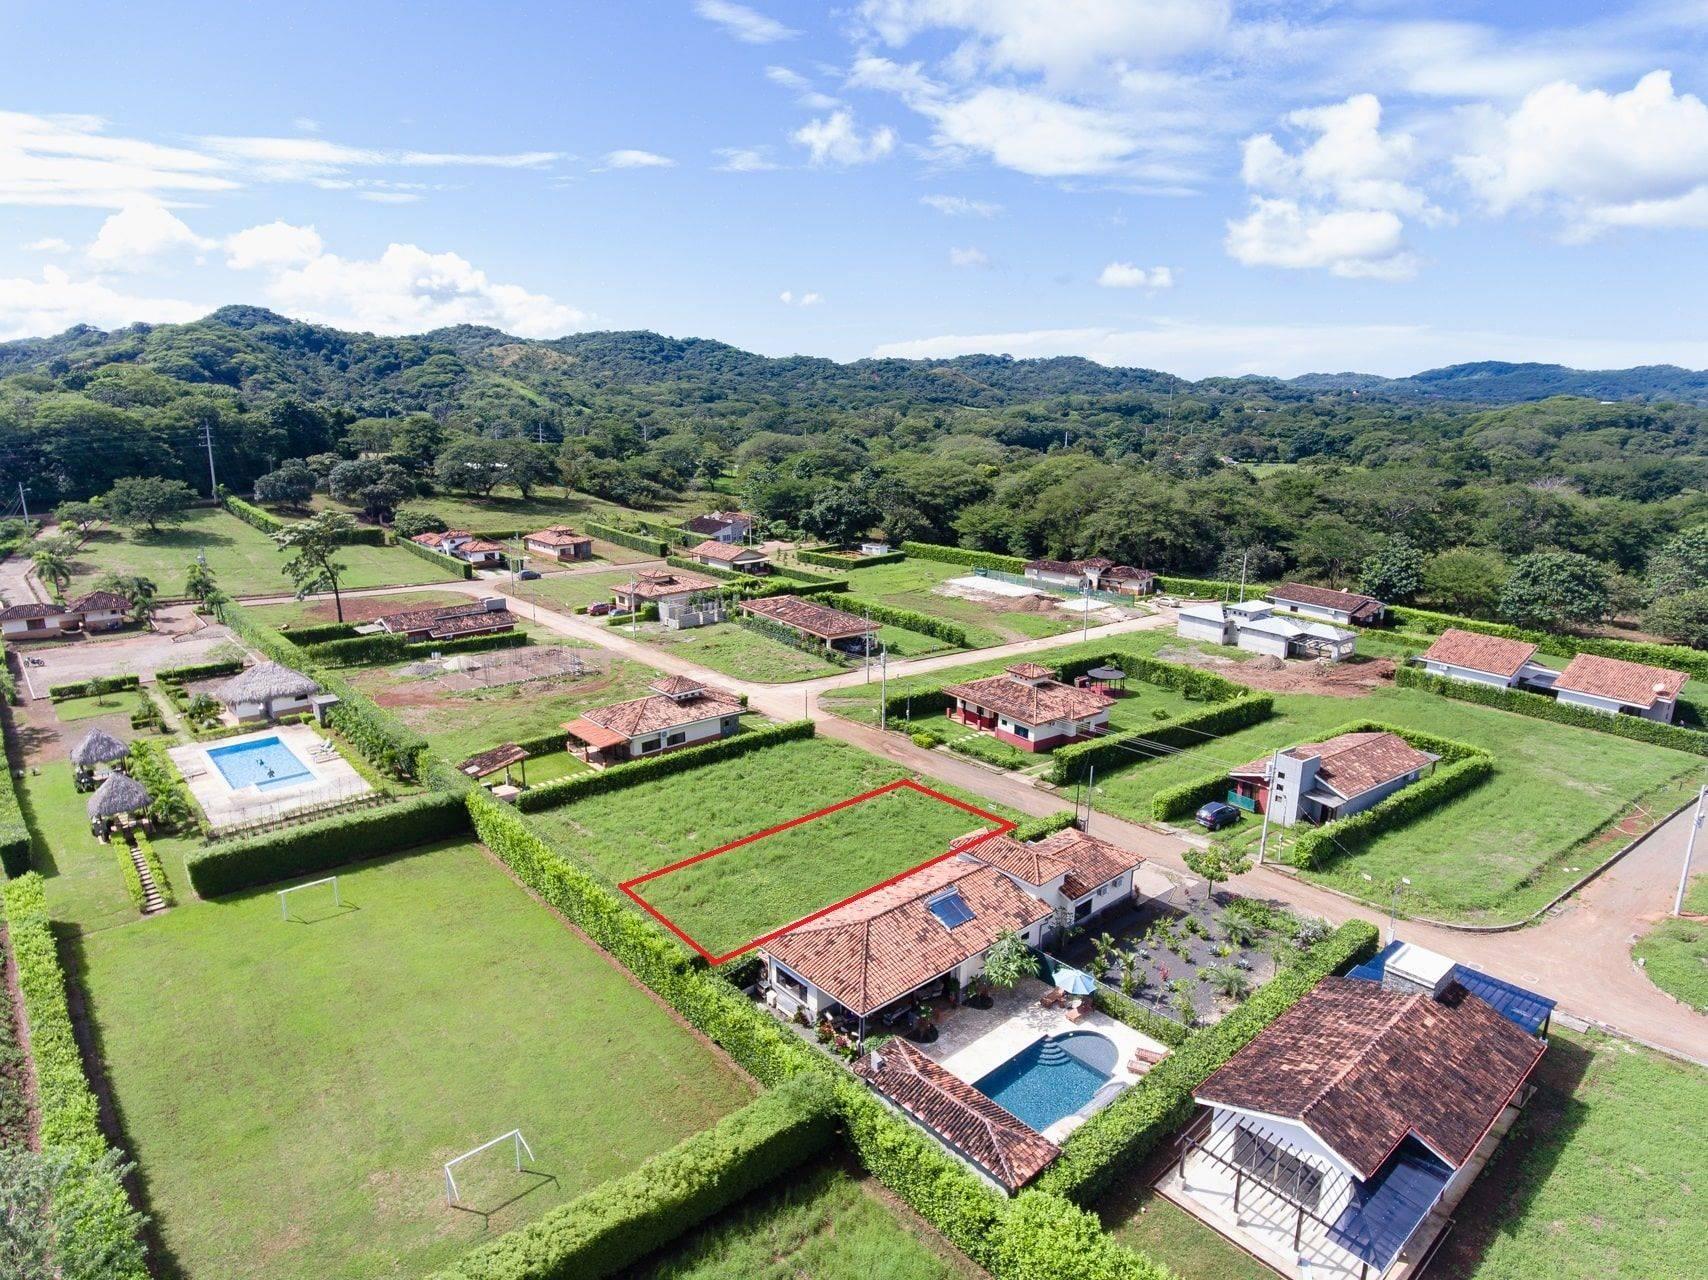 Loma Verde #79- Affordable Home Site close to Tamarindo